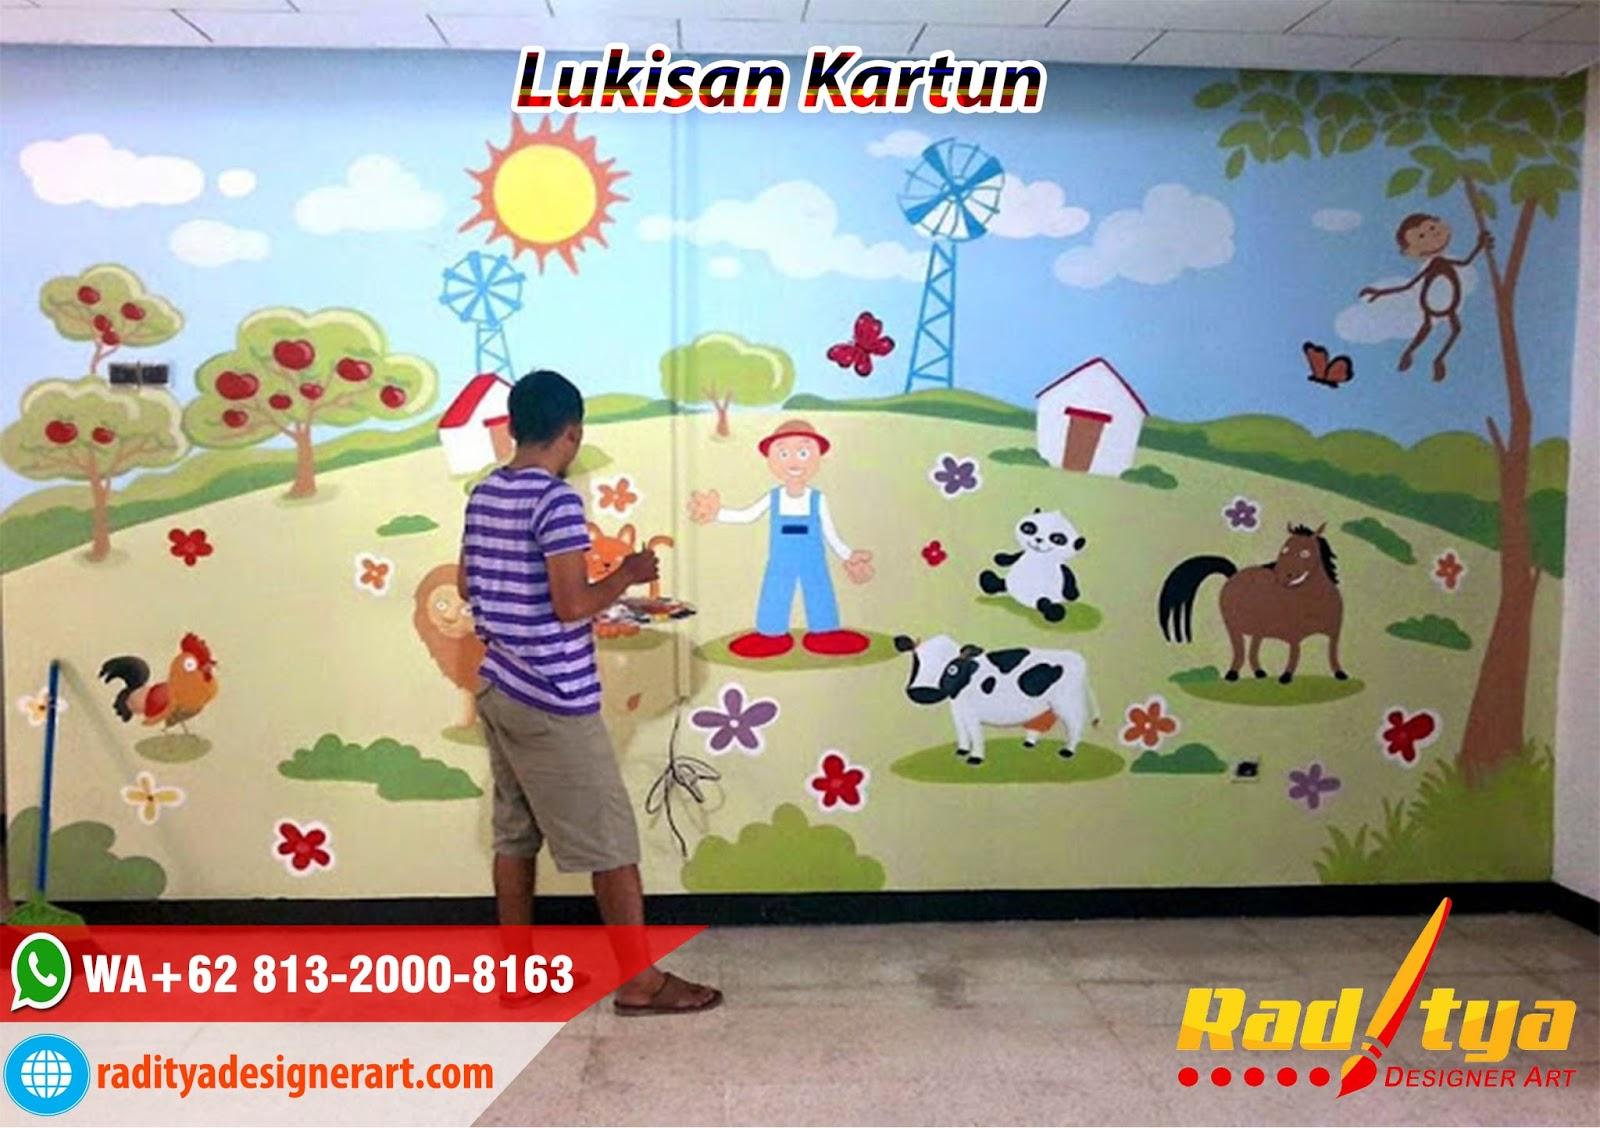 Ingin Dinding Kamar Anak Anda Lebih Indah Hubungi Kami Lukisan Kartun Wa 62 813 2000 8163 Lukisan dinding kamar anak